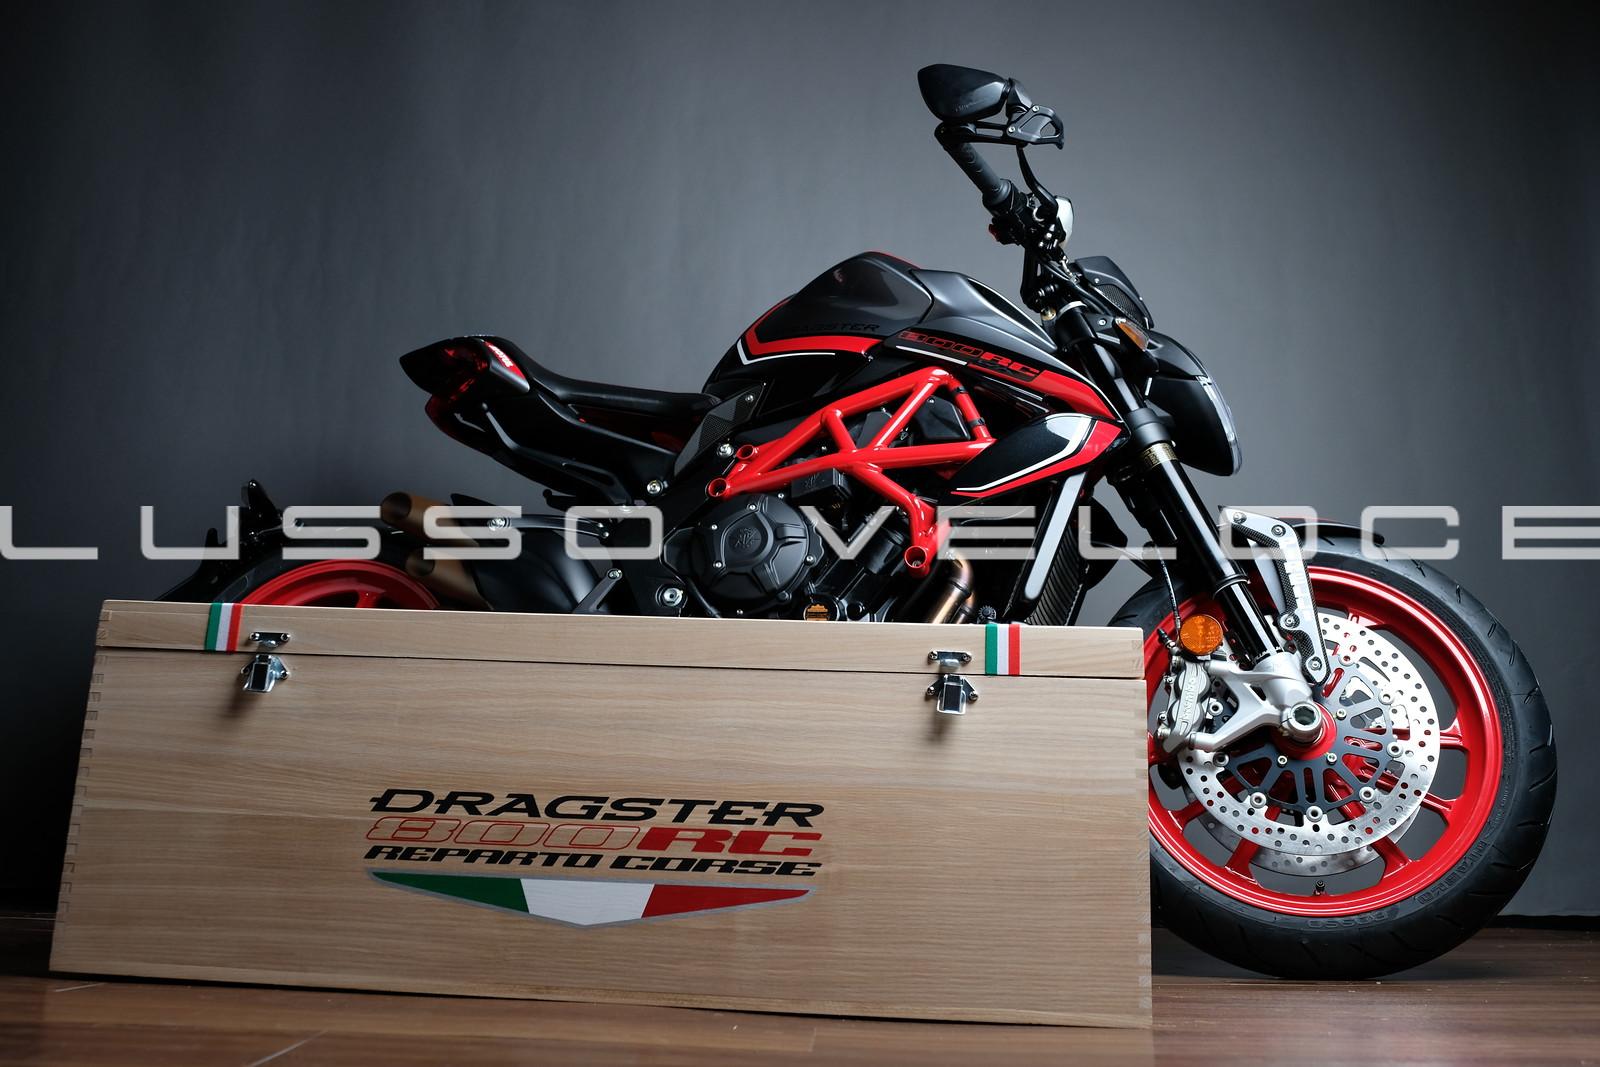 MV Agusta Dragster RC